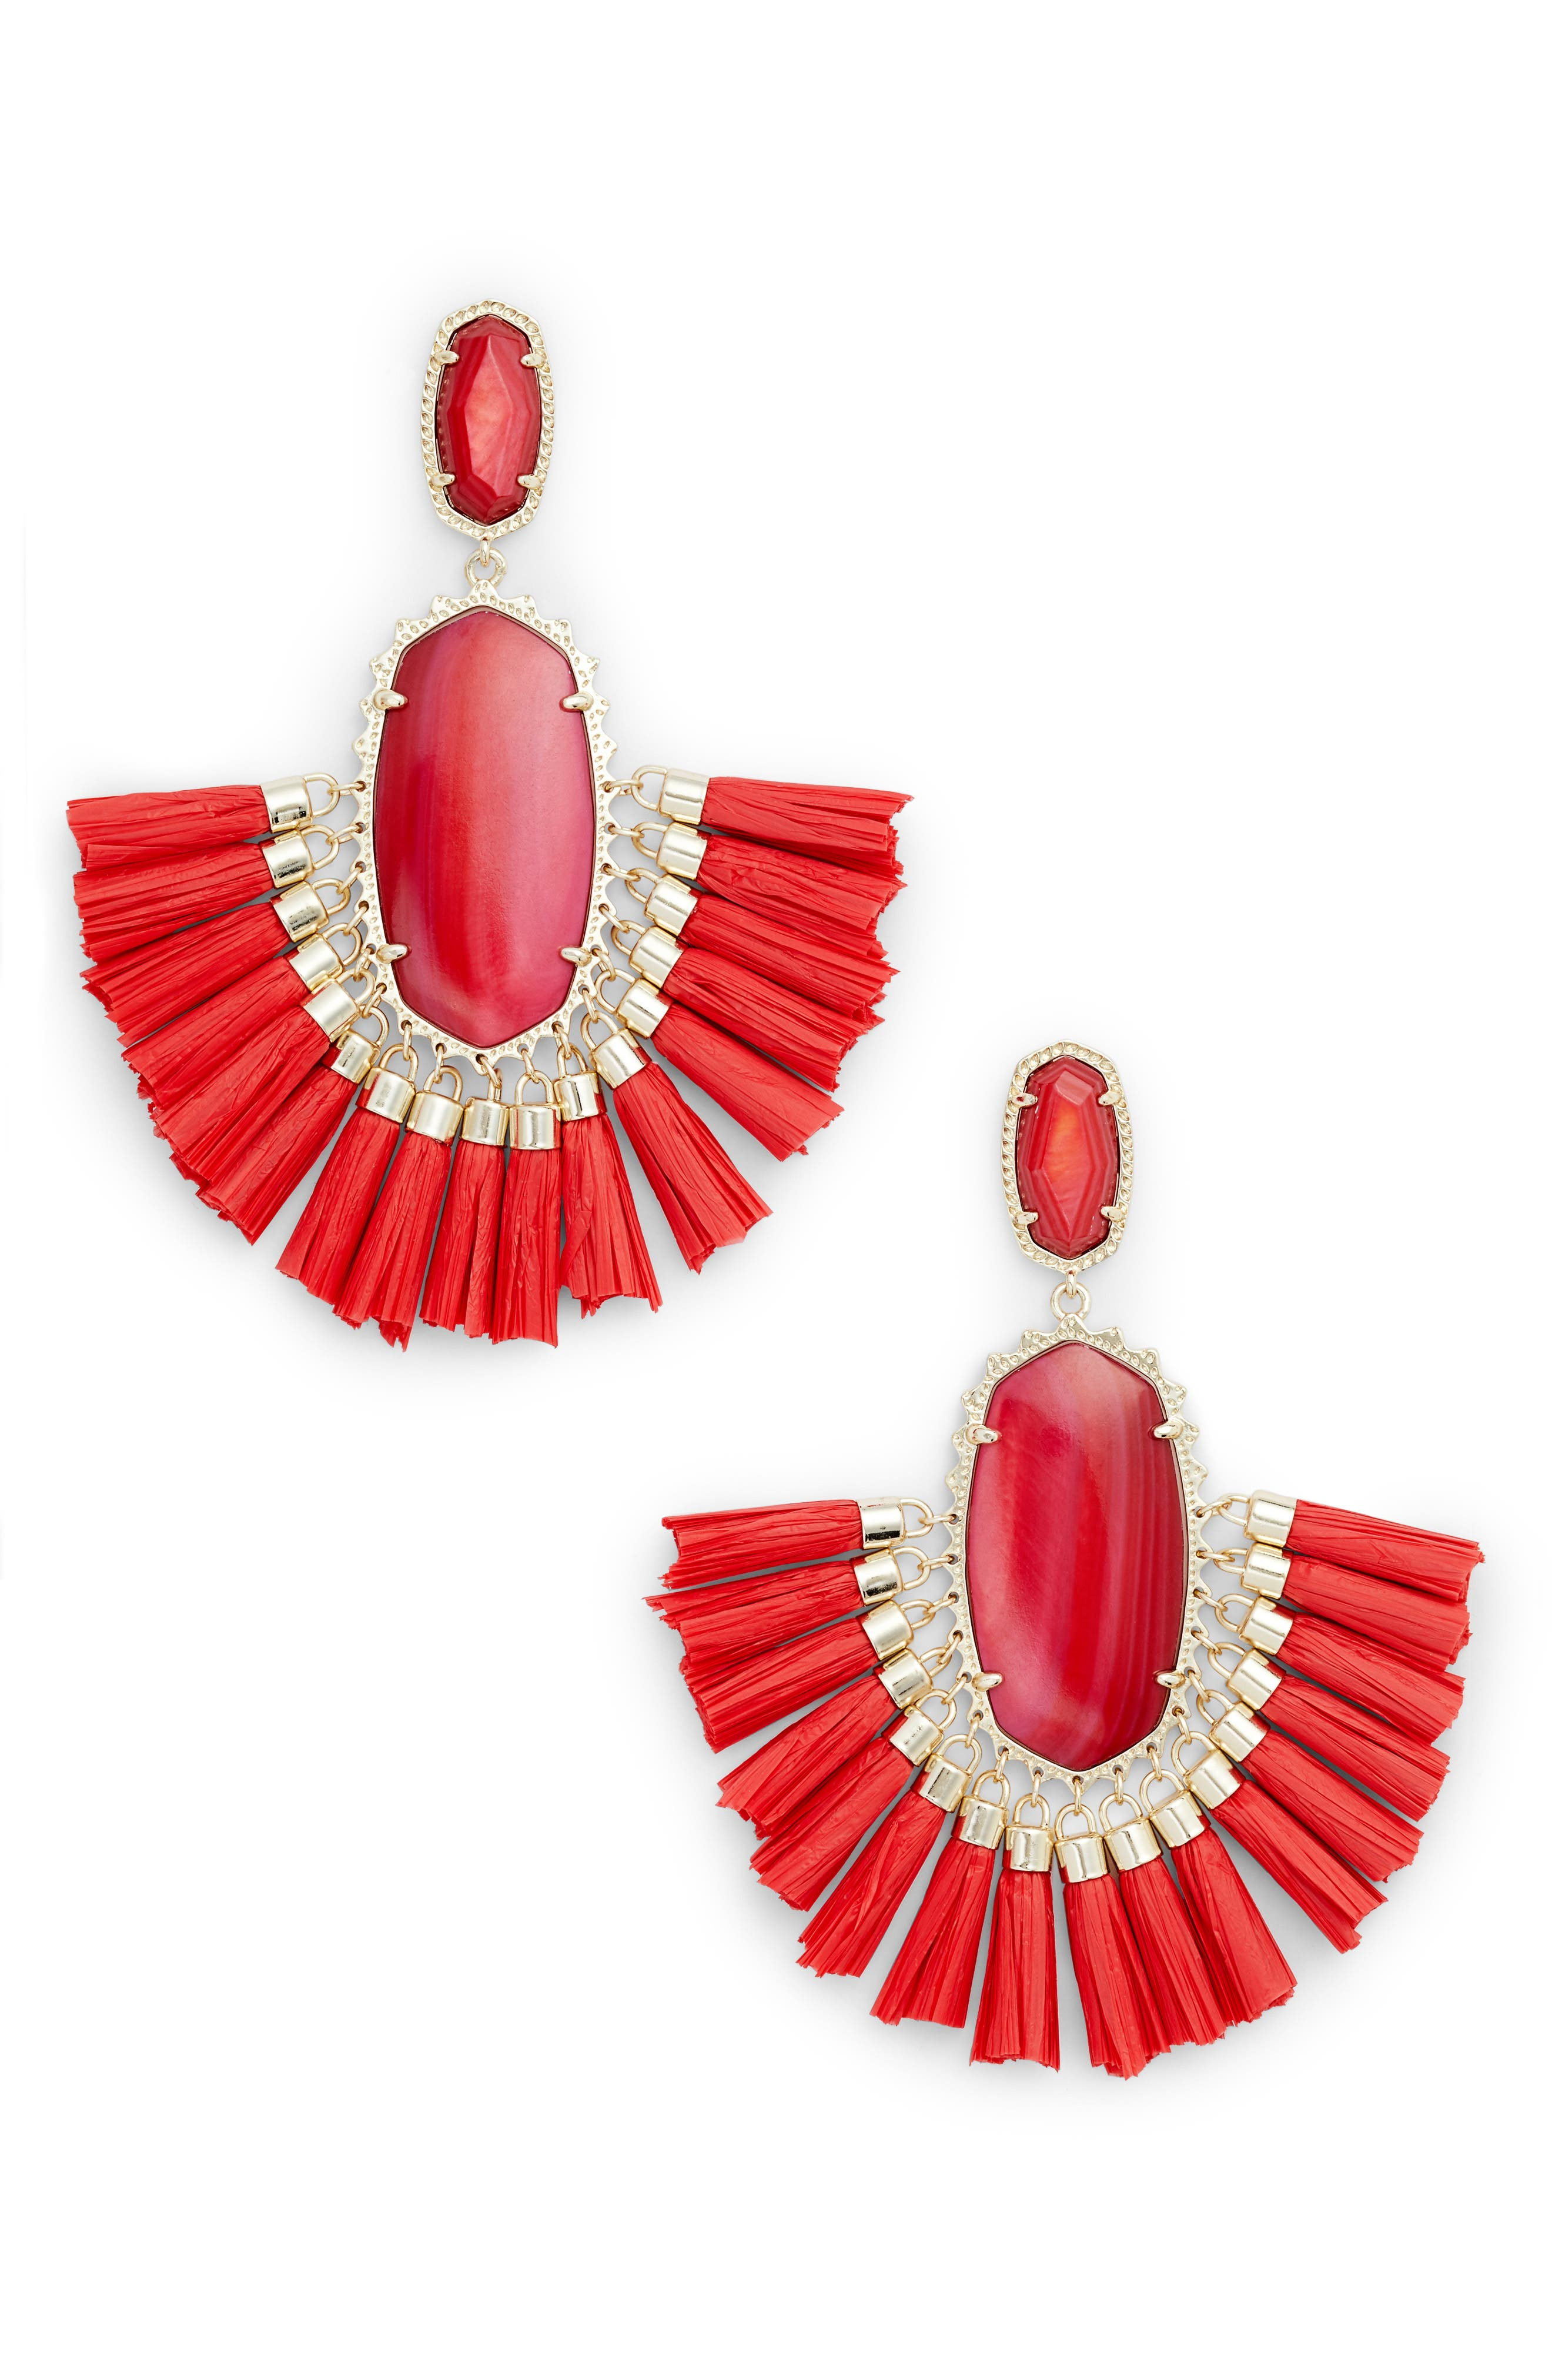 Cristina Stone Tassel Earrings,                             Main thumbnail 1, color,                             Red Mop/ Gold